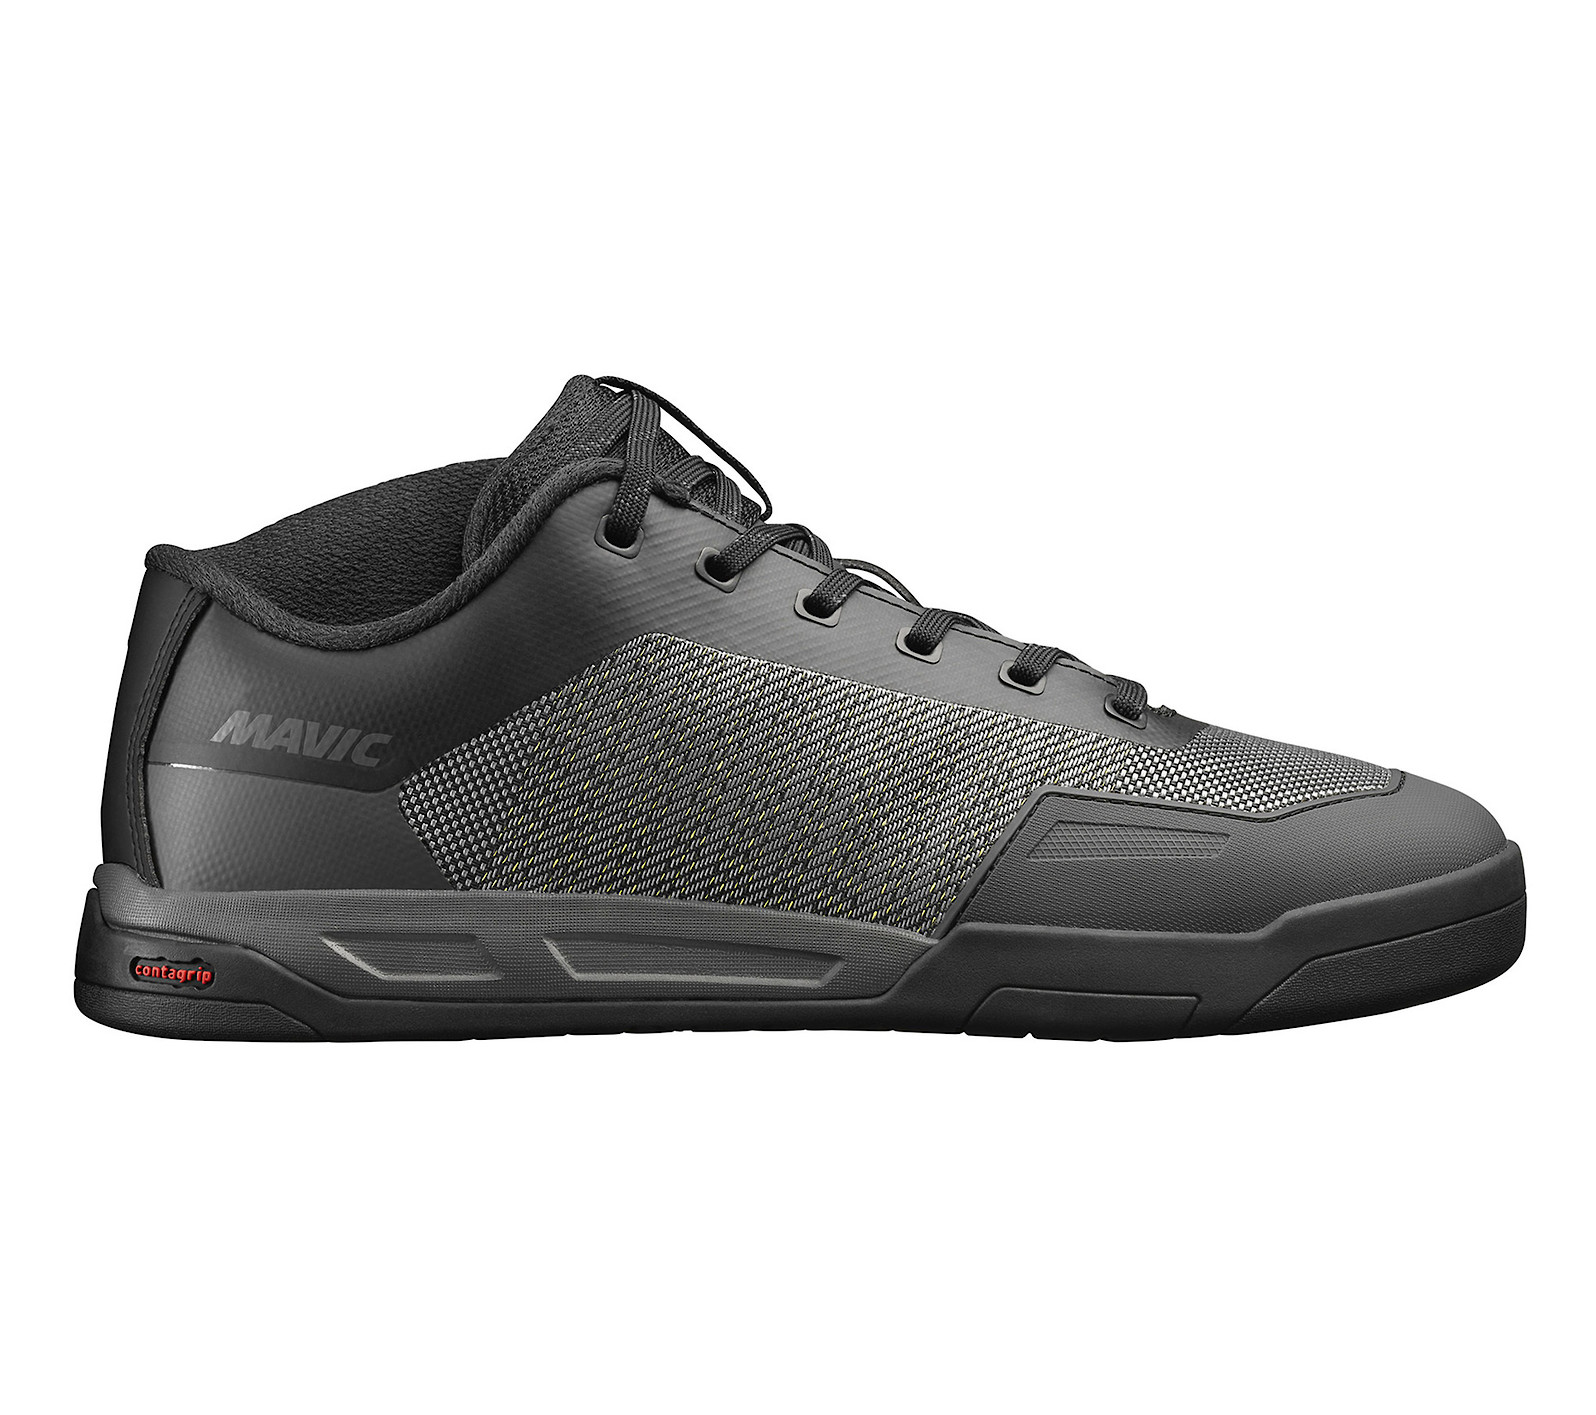 Mavic Deemax Pro Flat Pedal Shoe